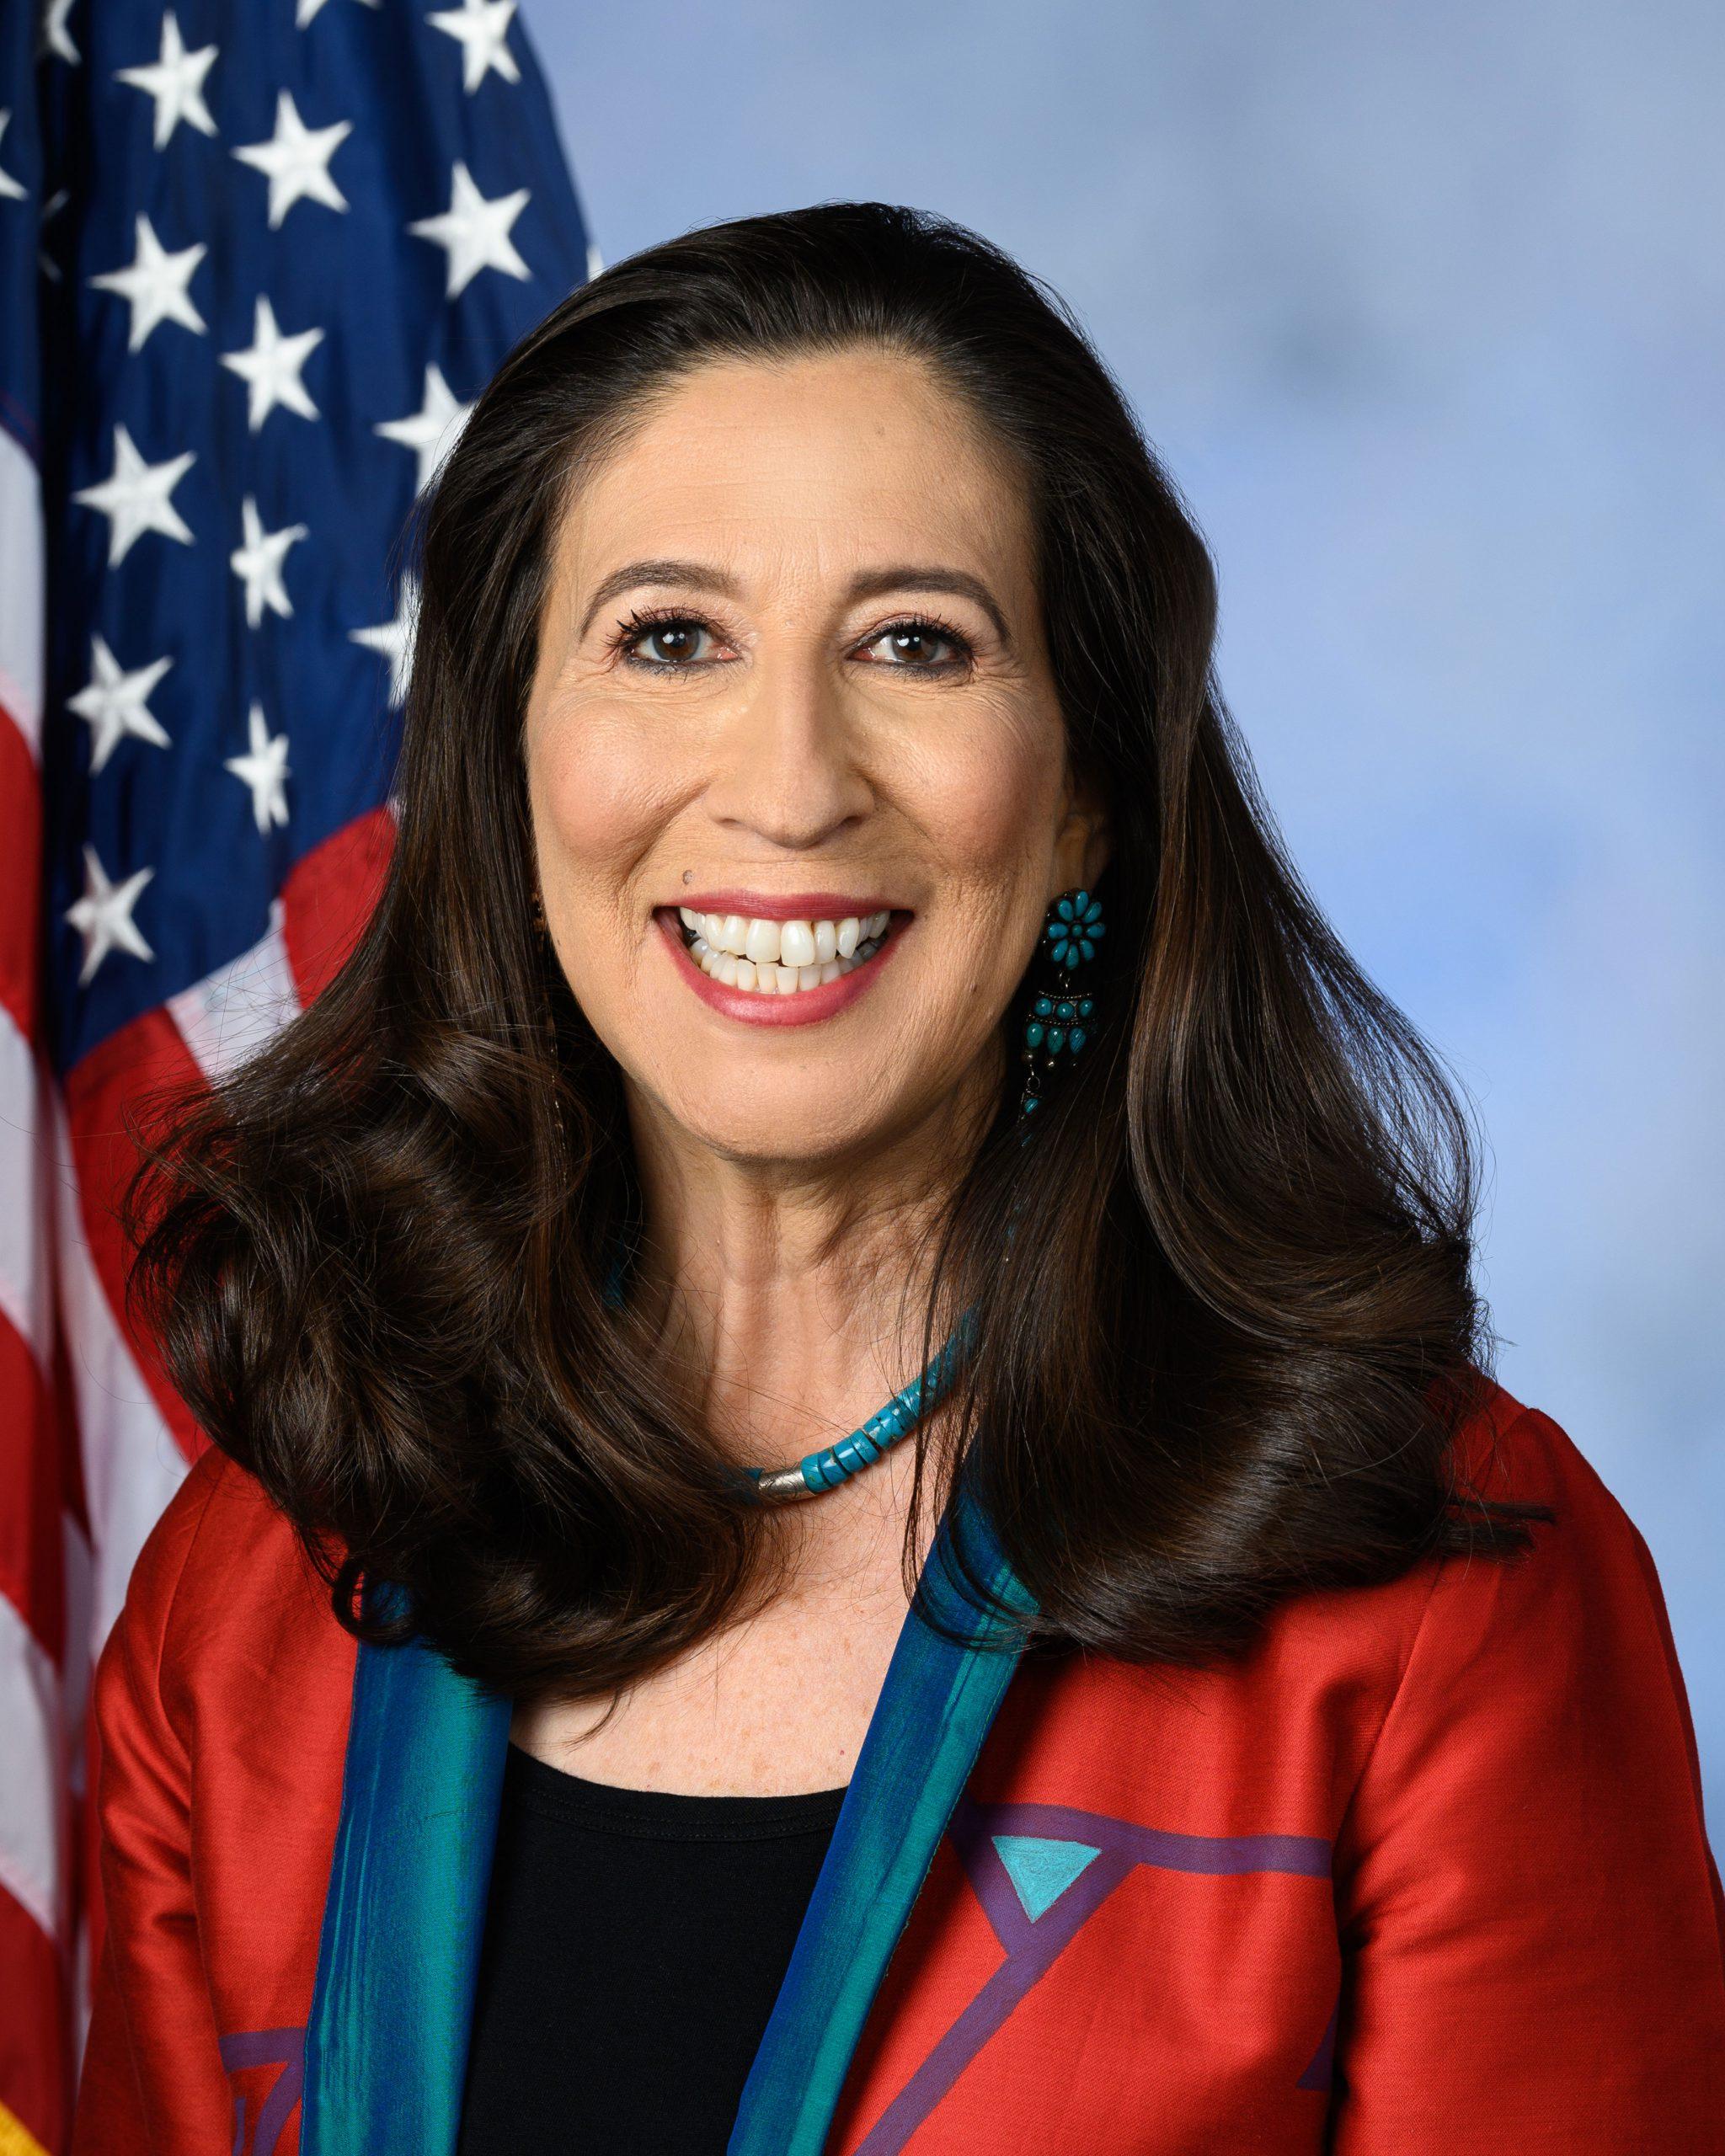 Rep. Teresa Leger Fernandez